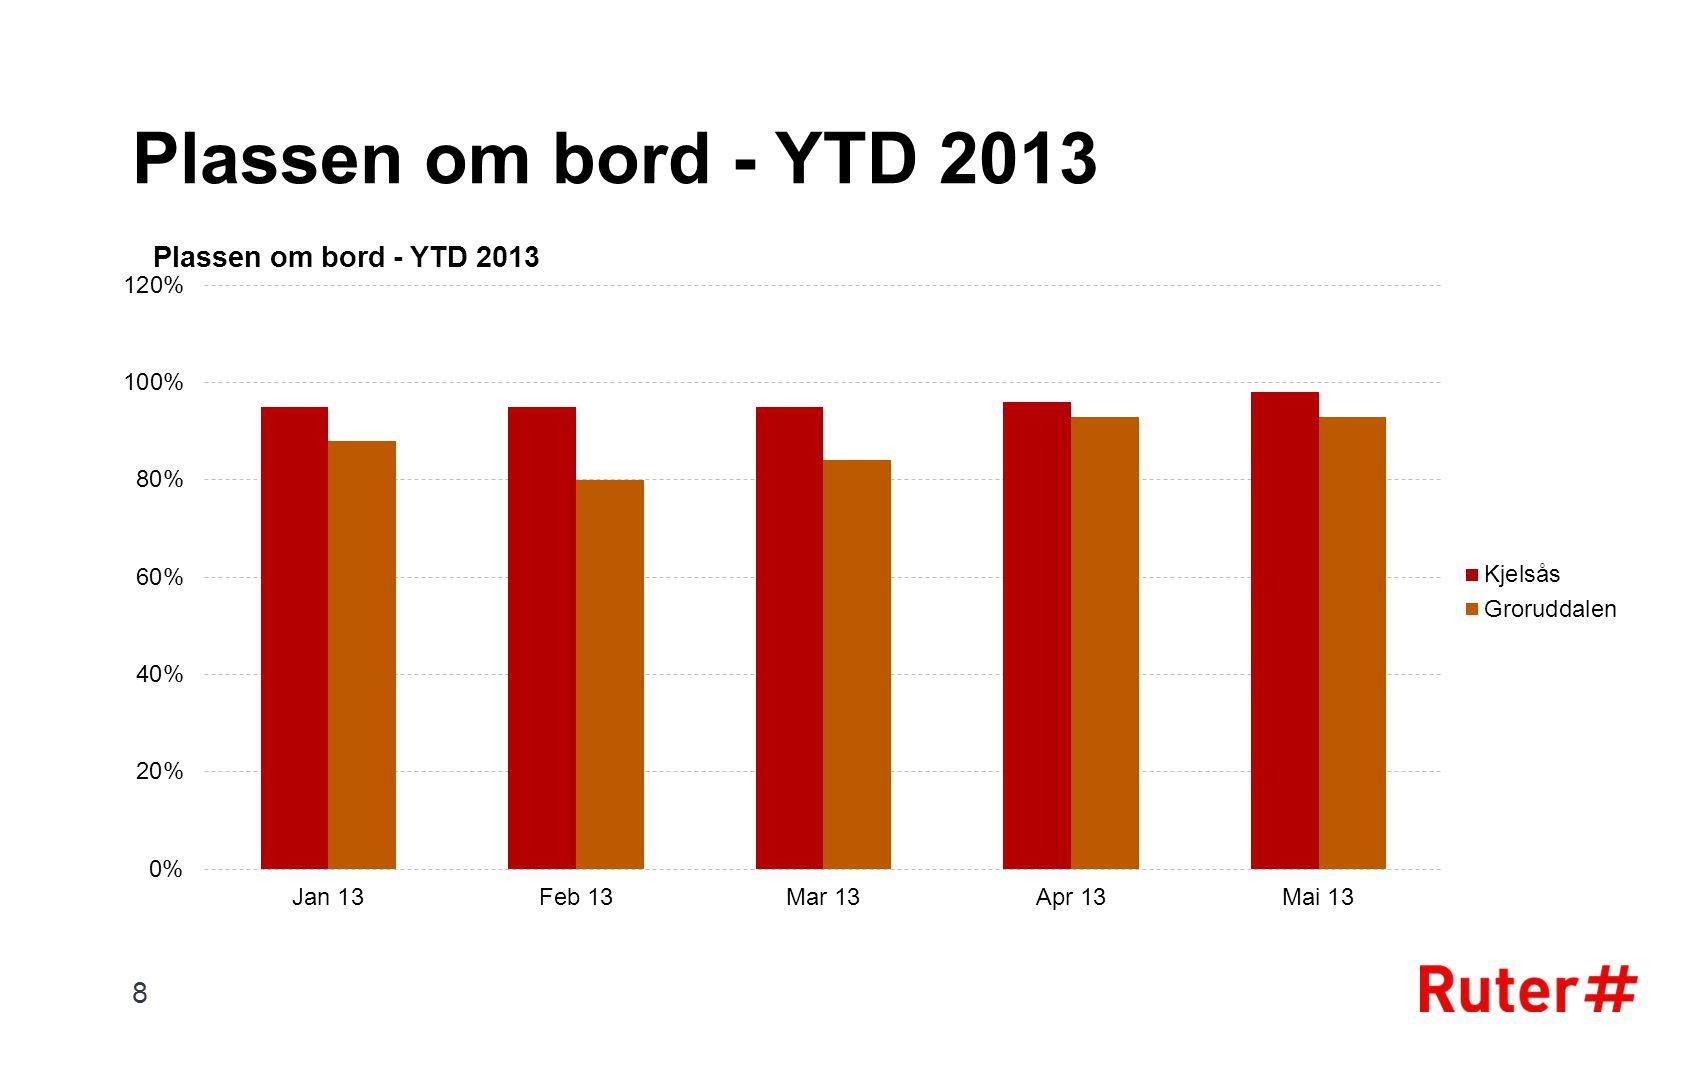 Plassen om bord - YTD 2013